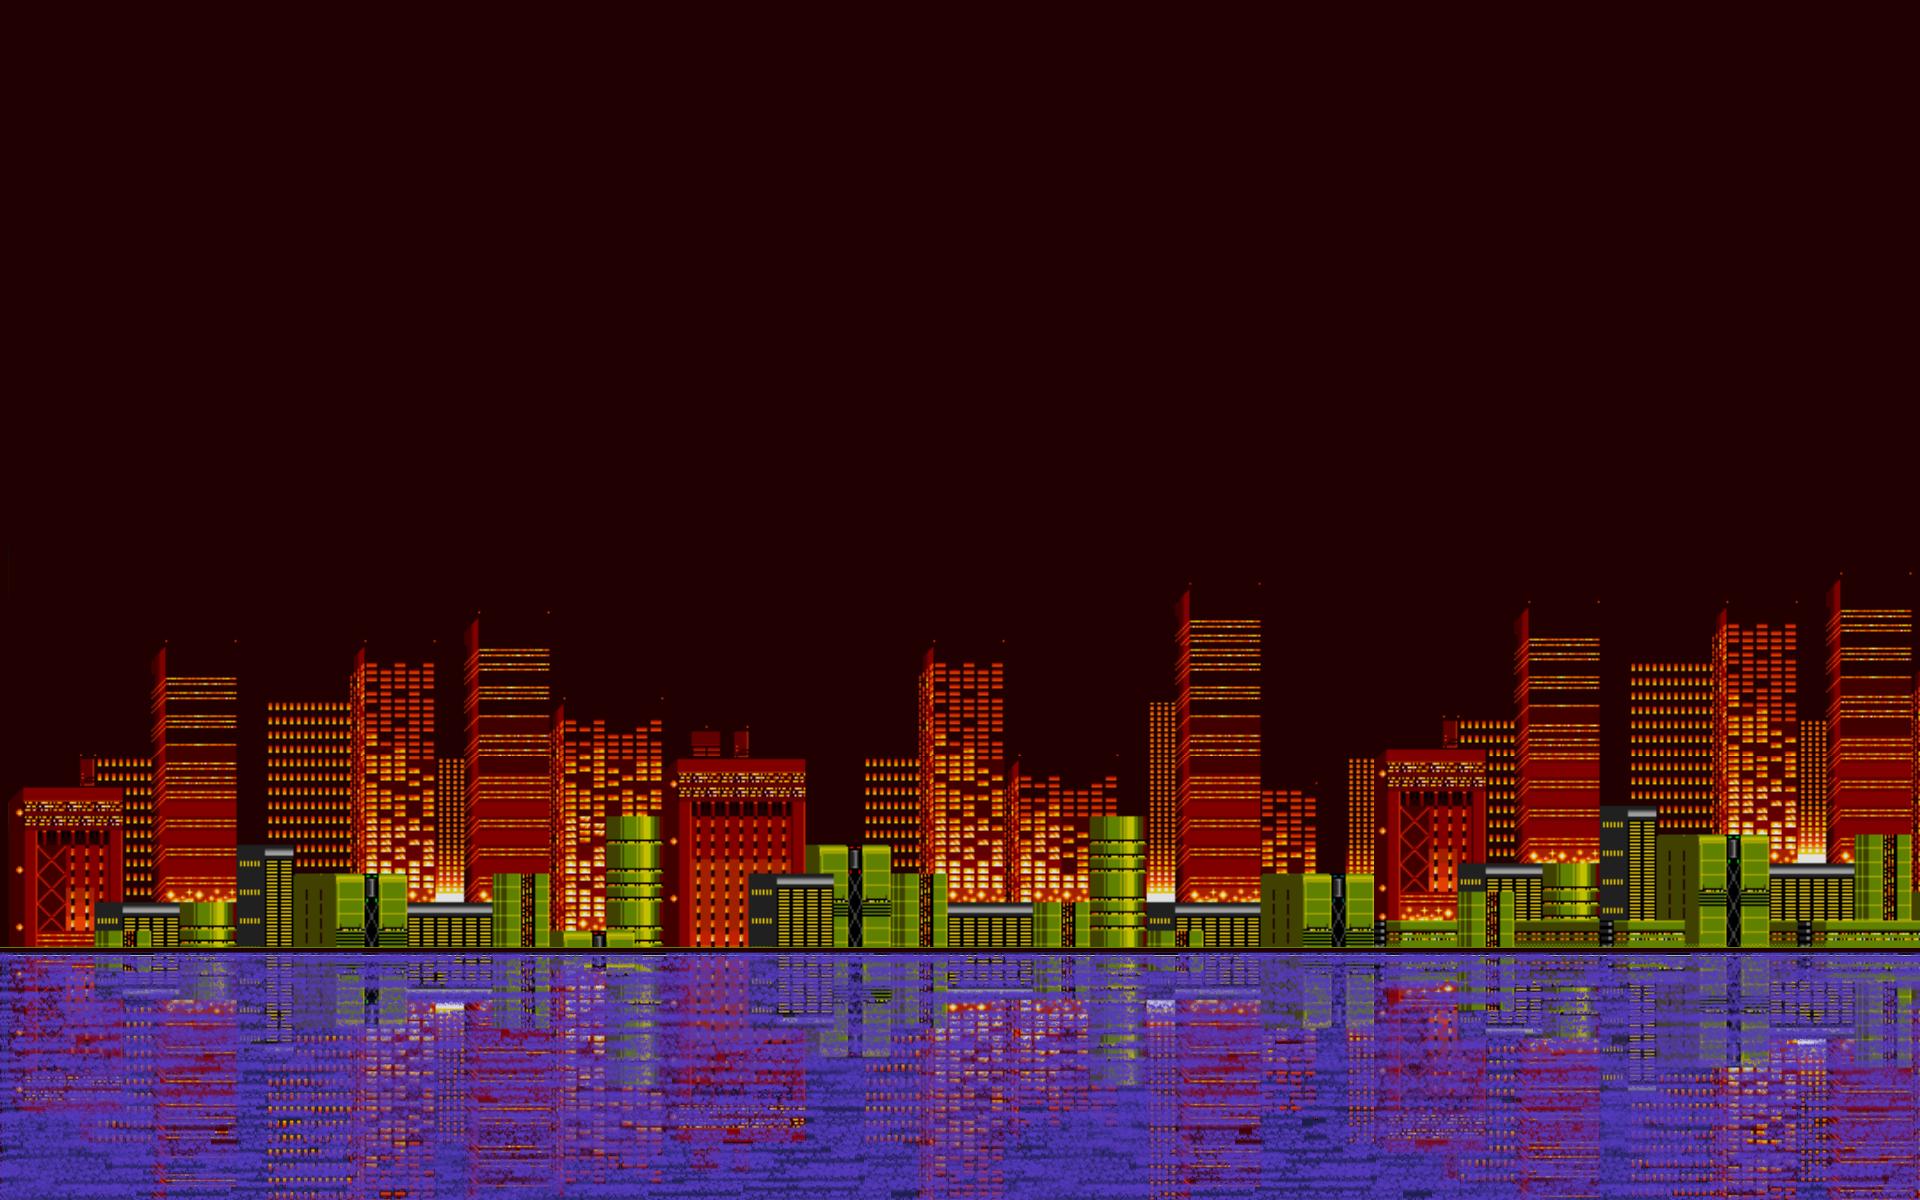 Android Wallpaper 8 Bit Landscapes 1920x1200